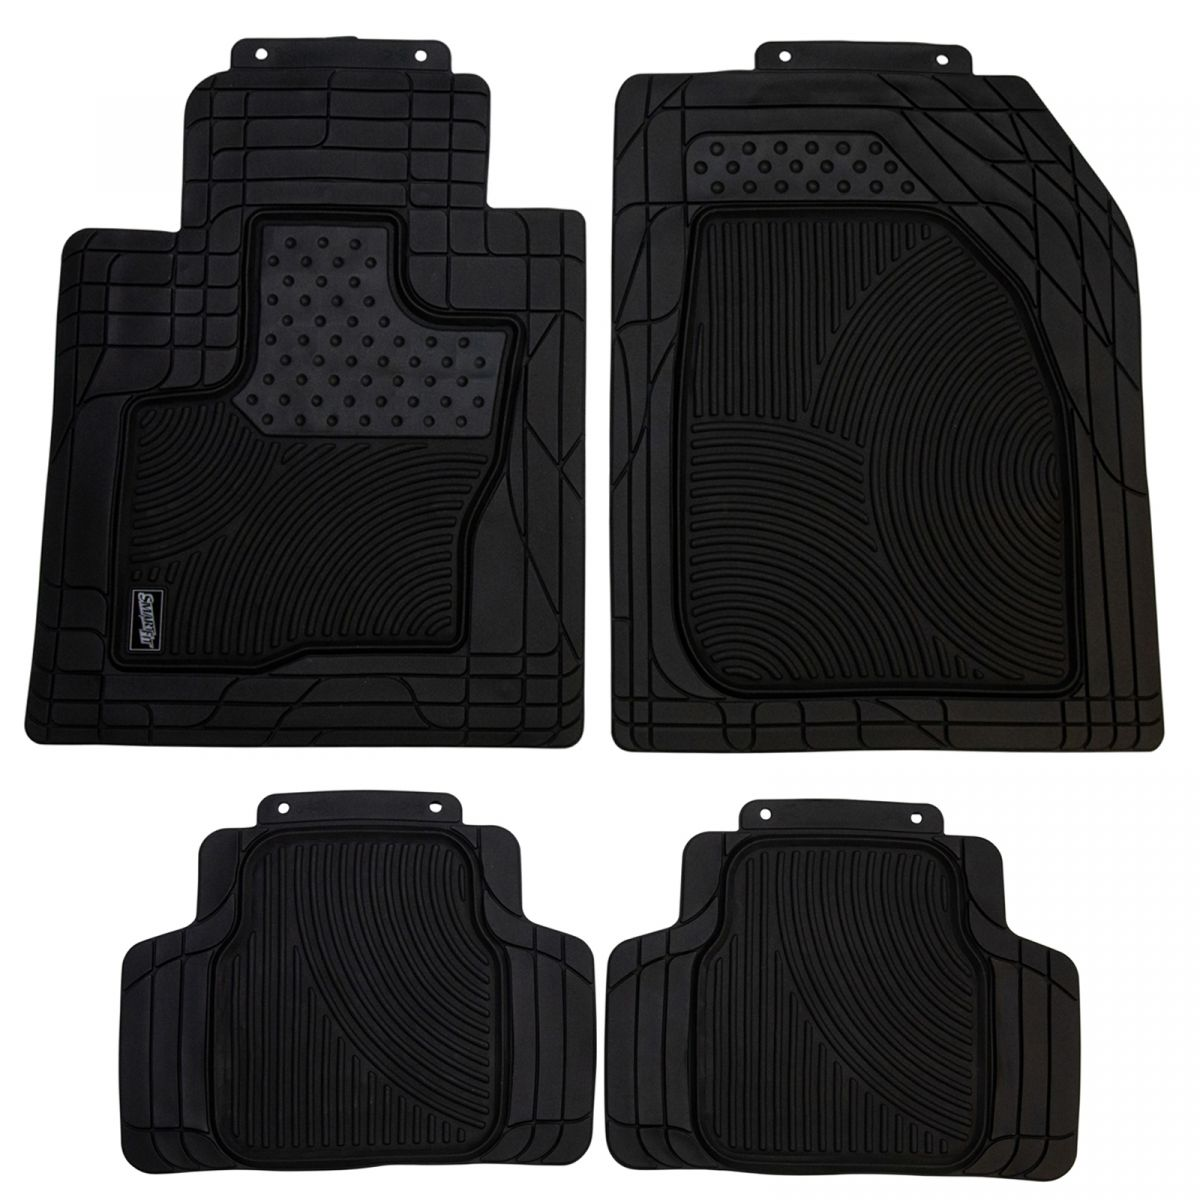 Armor All Custom Accessories Smart Fit Black Rubber Floor Mat Set Of 4 New Ebay